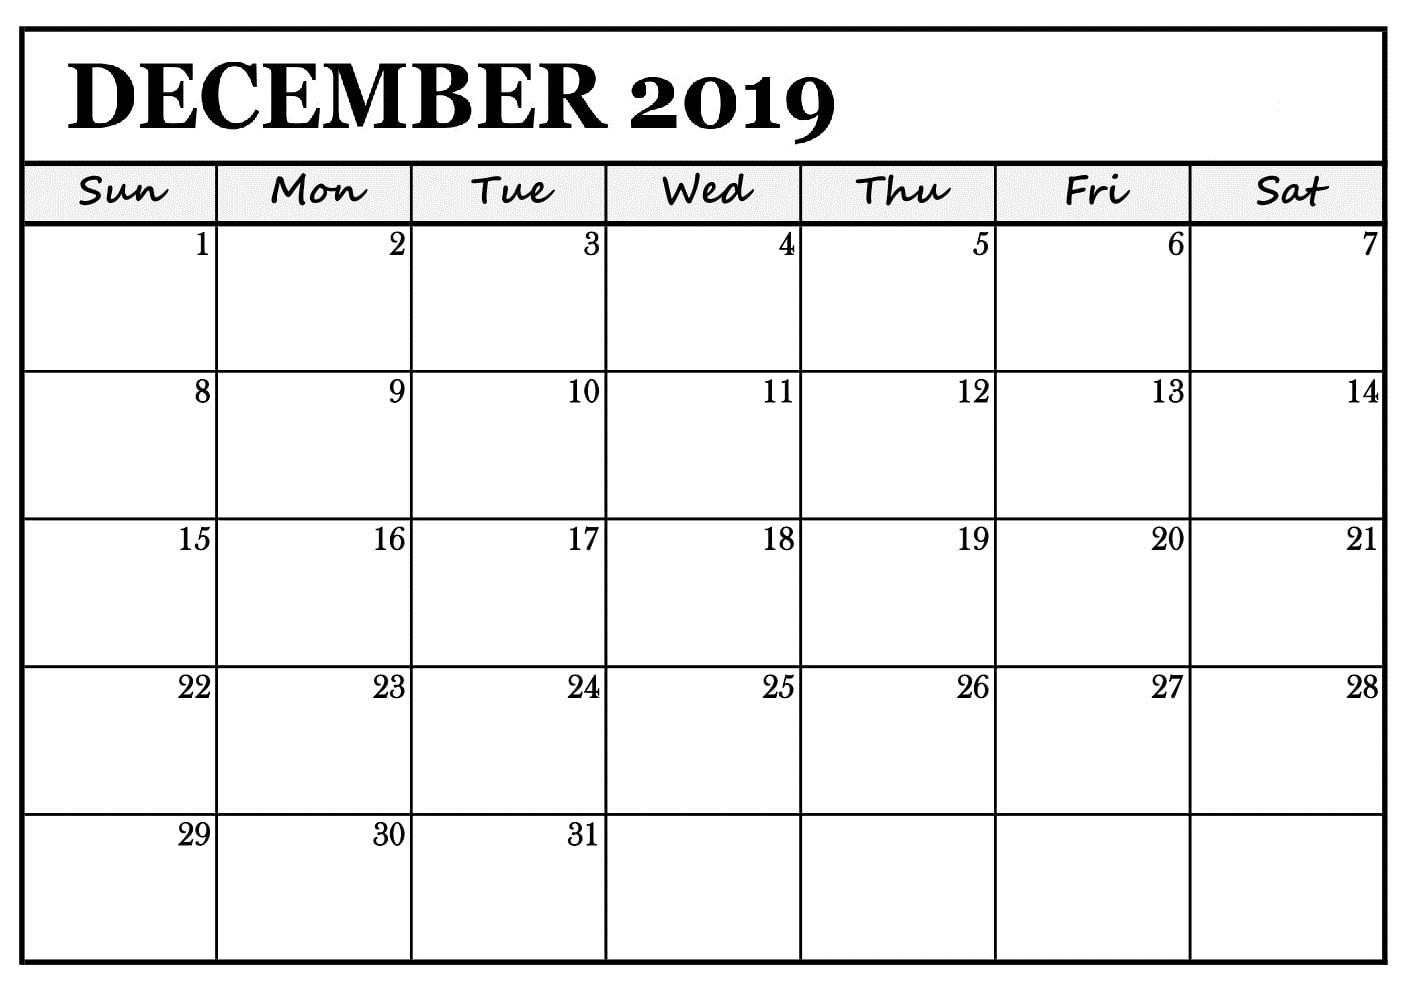 Calendar December 2019 Printable Reminder